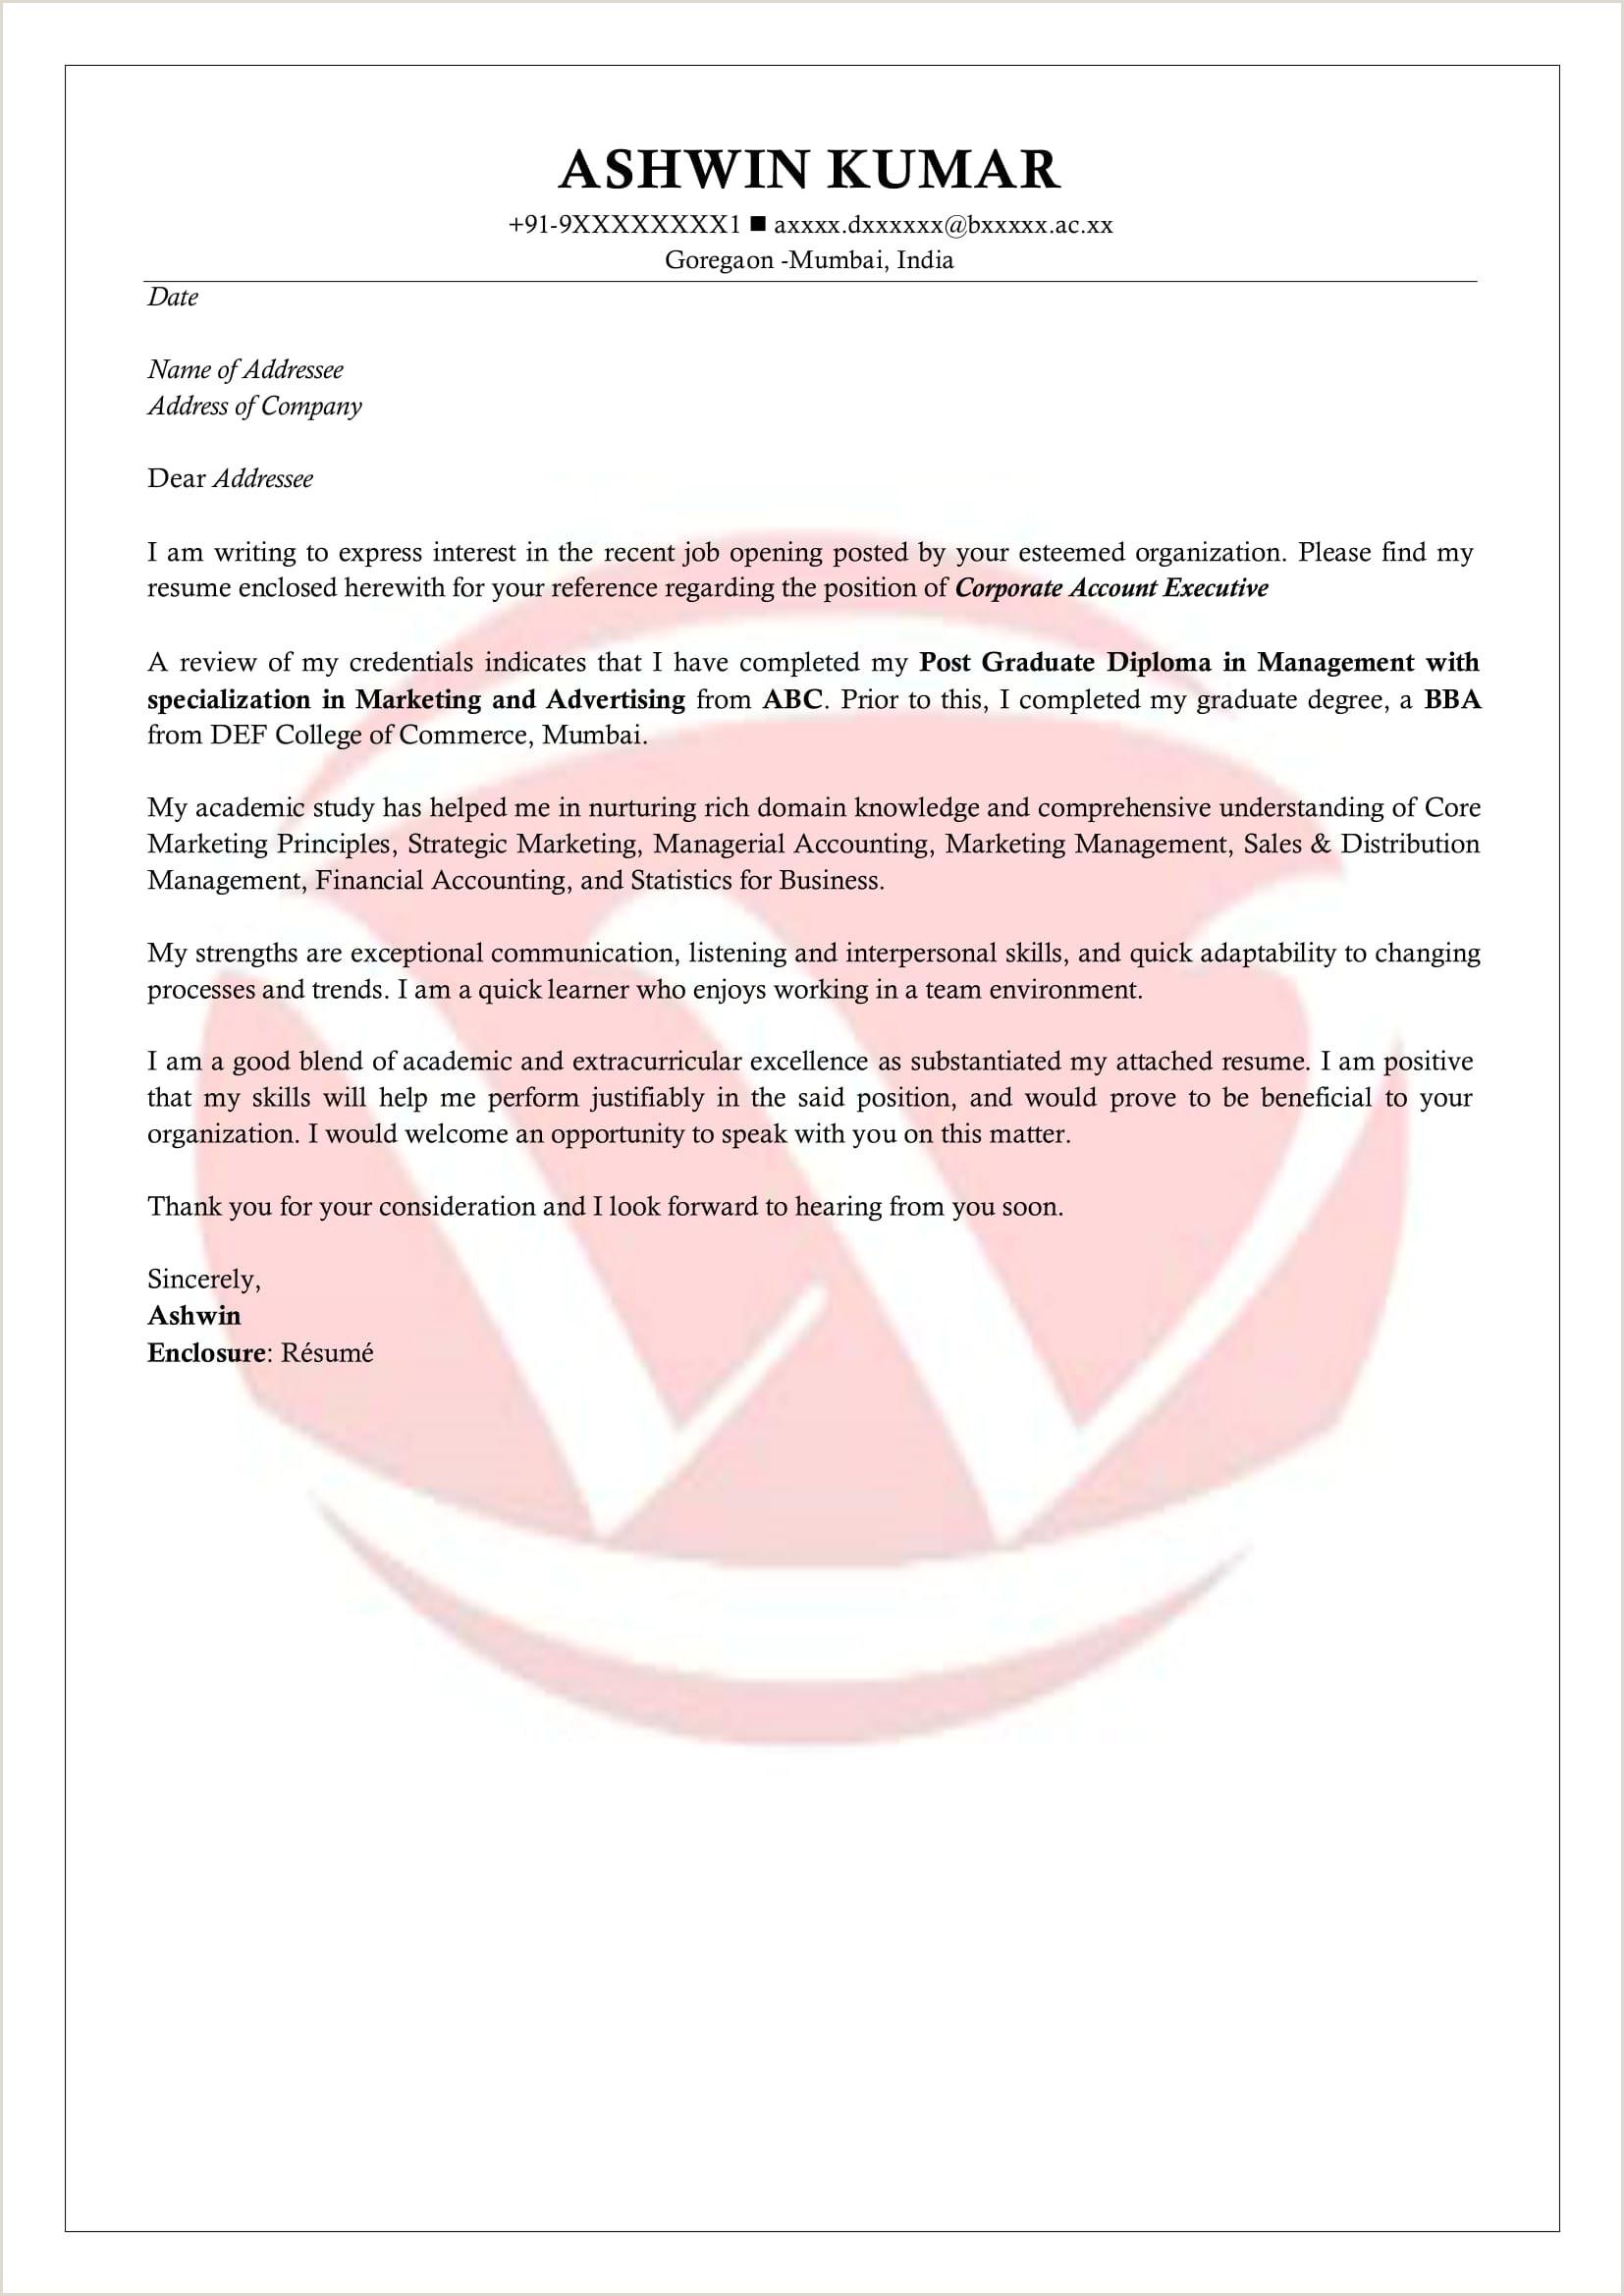 Bca Fresher Resume Format Pdf Freshers Sample Cover Letter Format Download Cover Letter